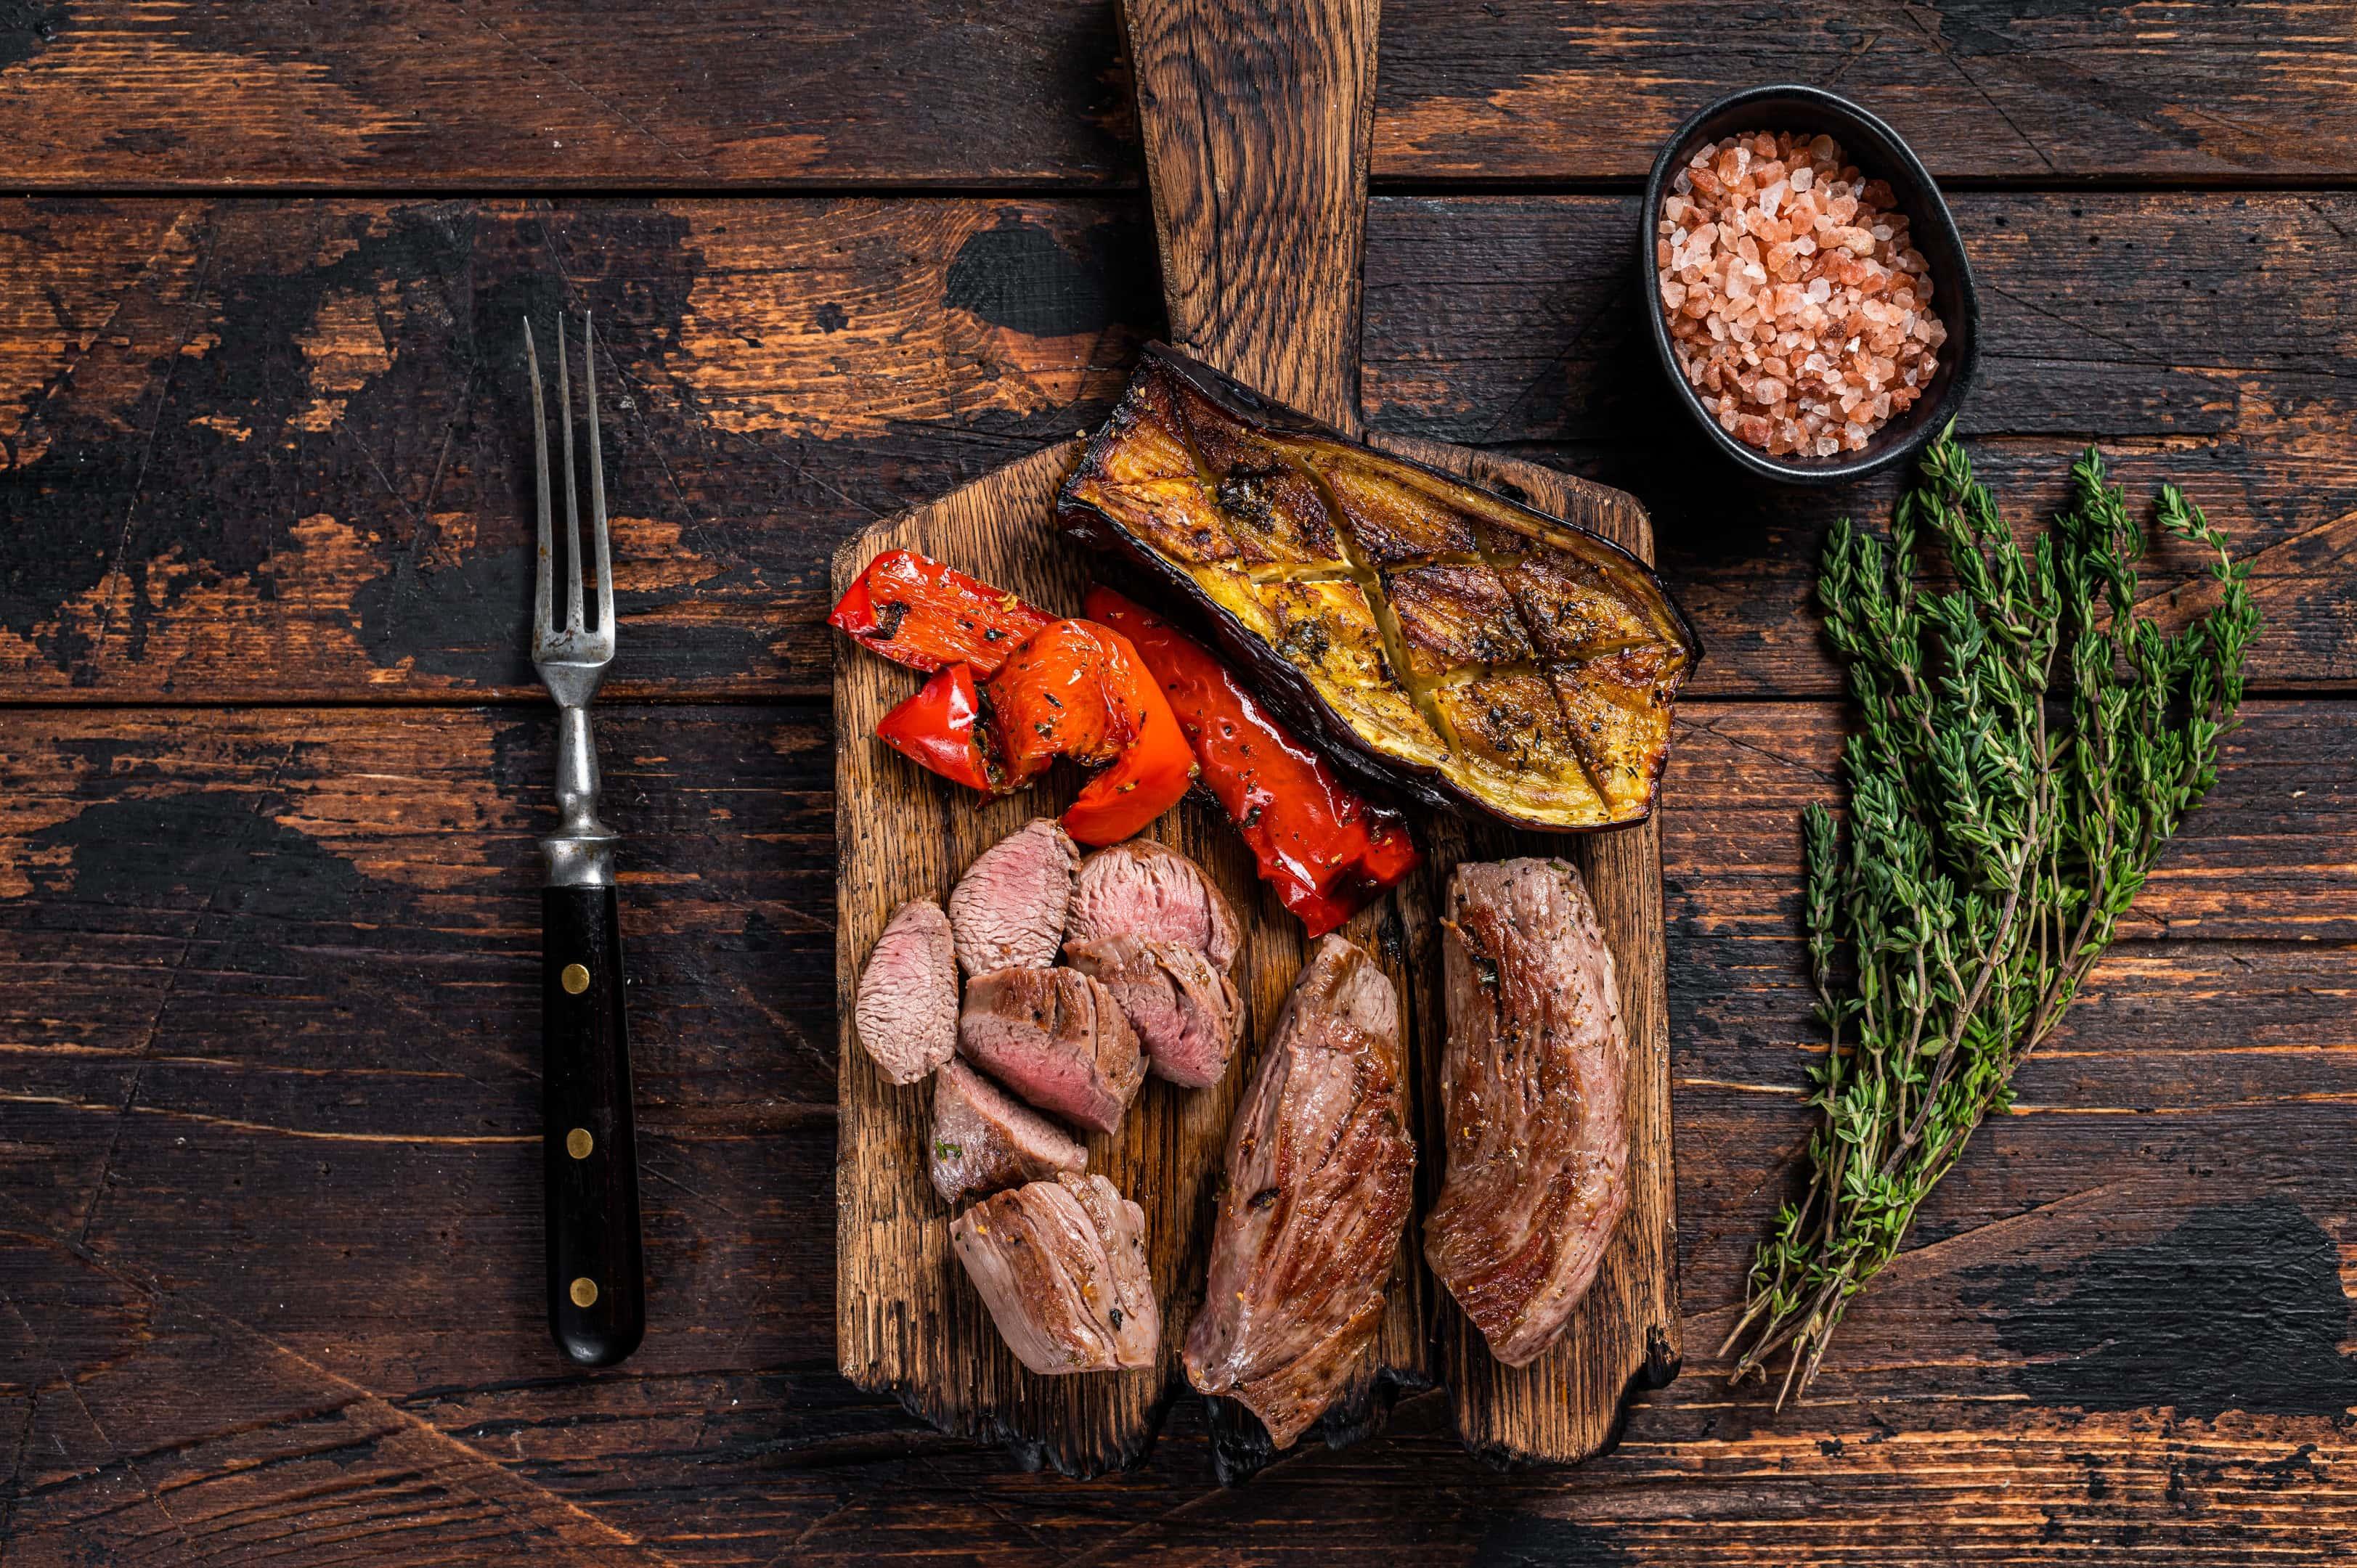 Roasted venison tenderloin fillet on wooden cutting board